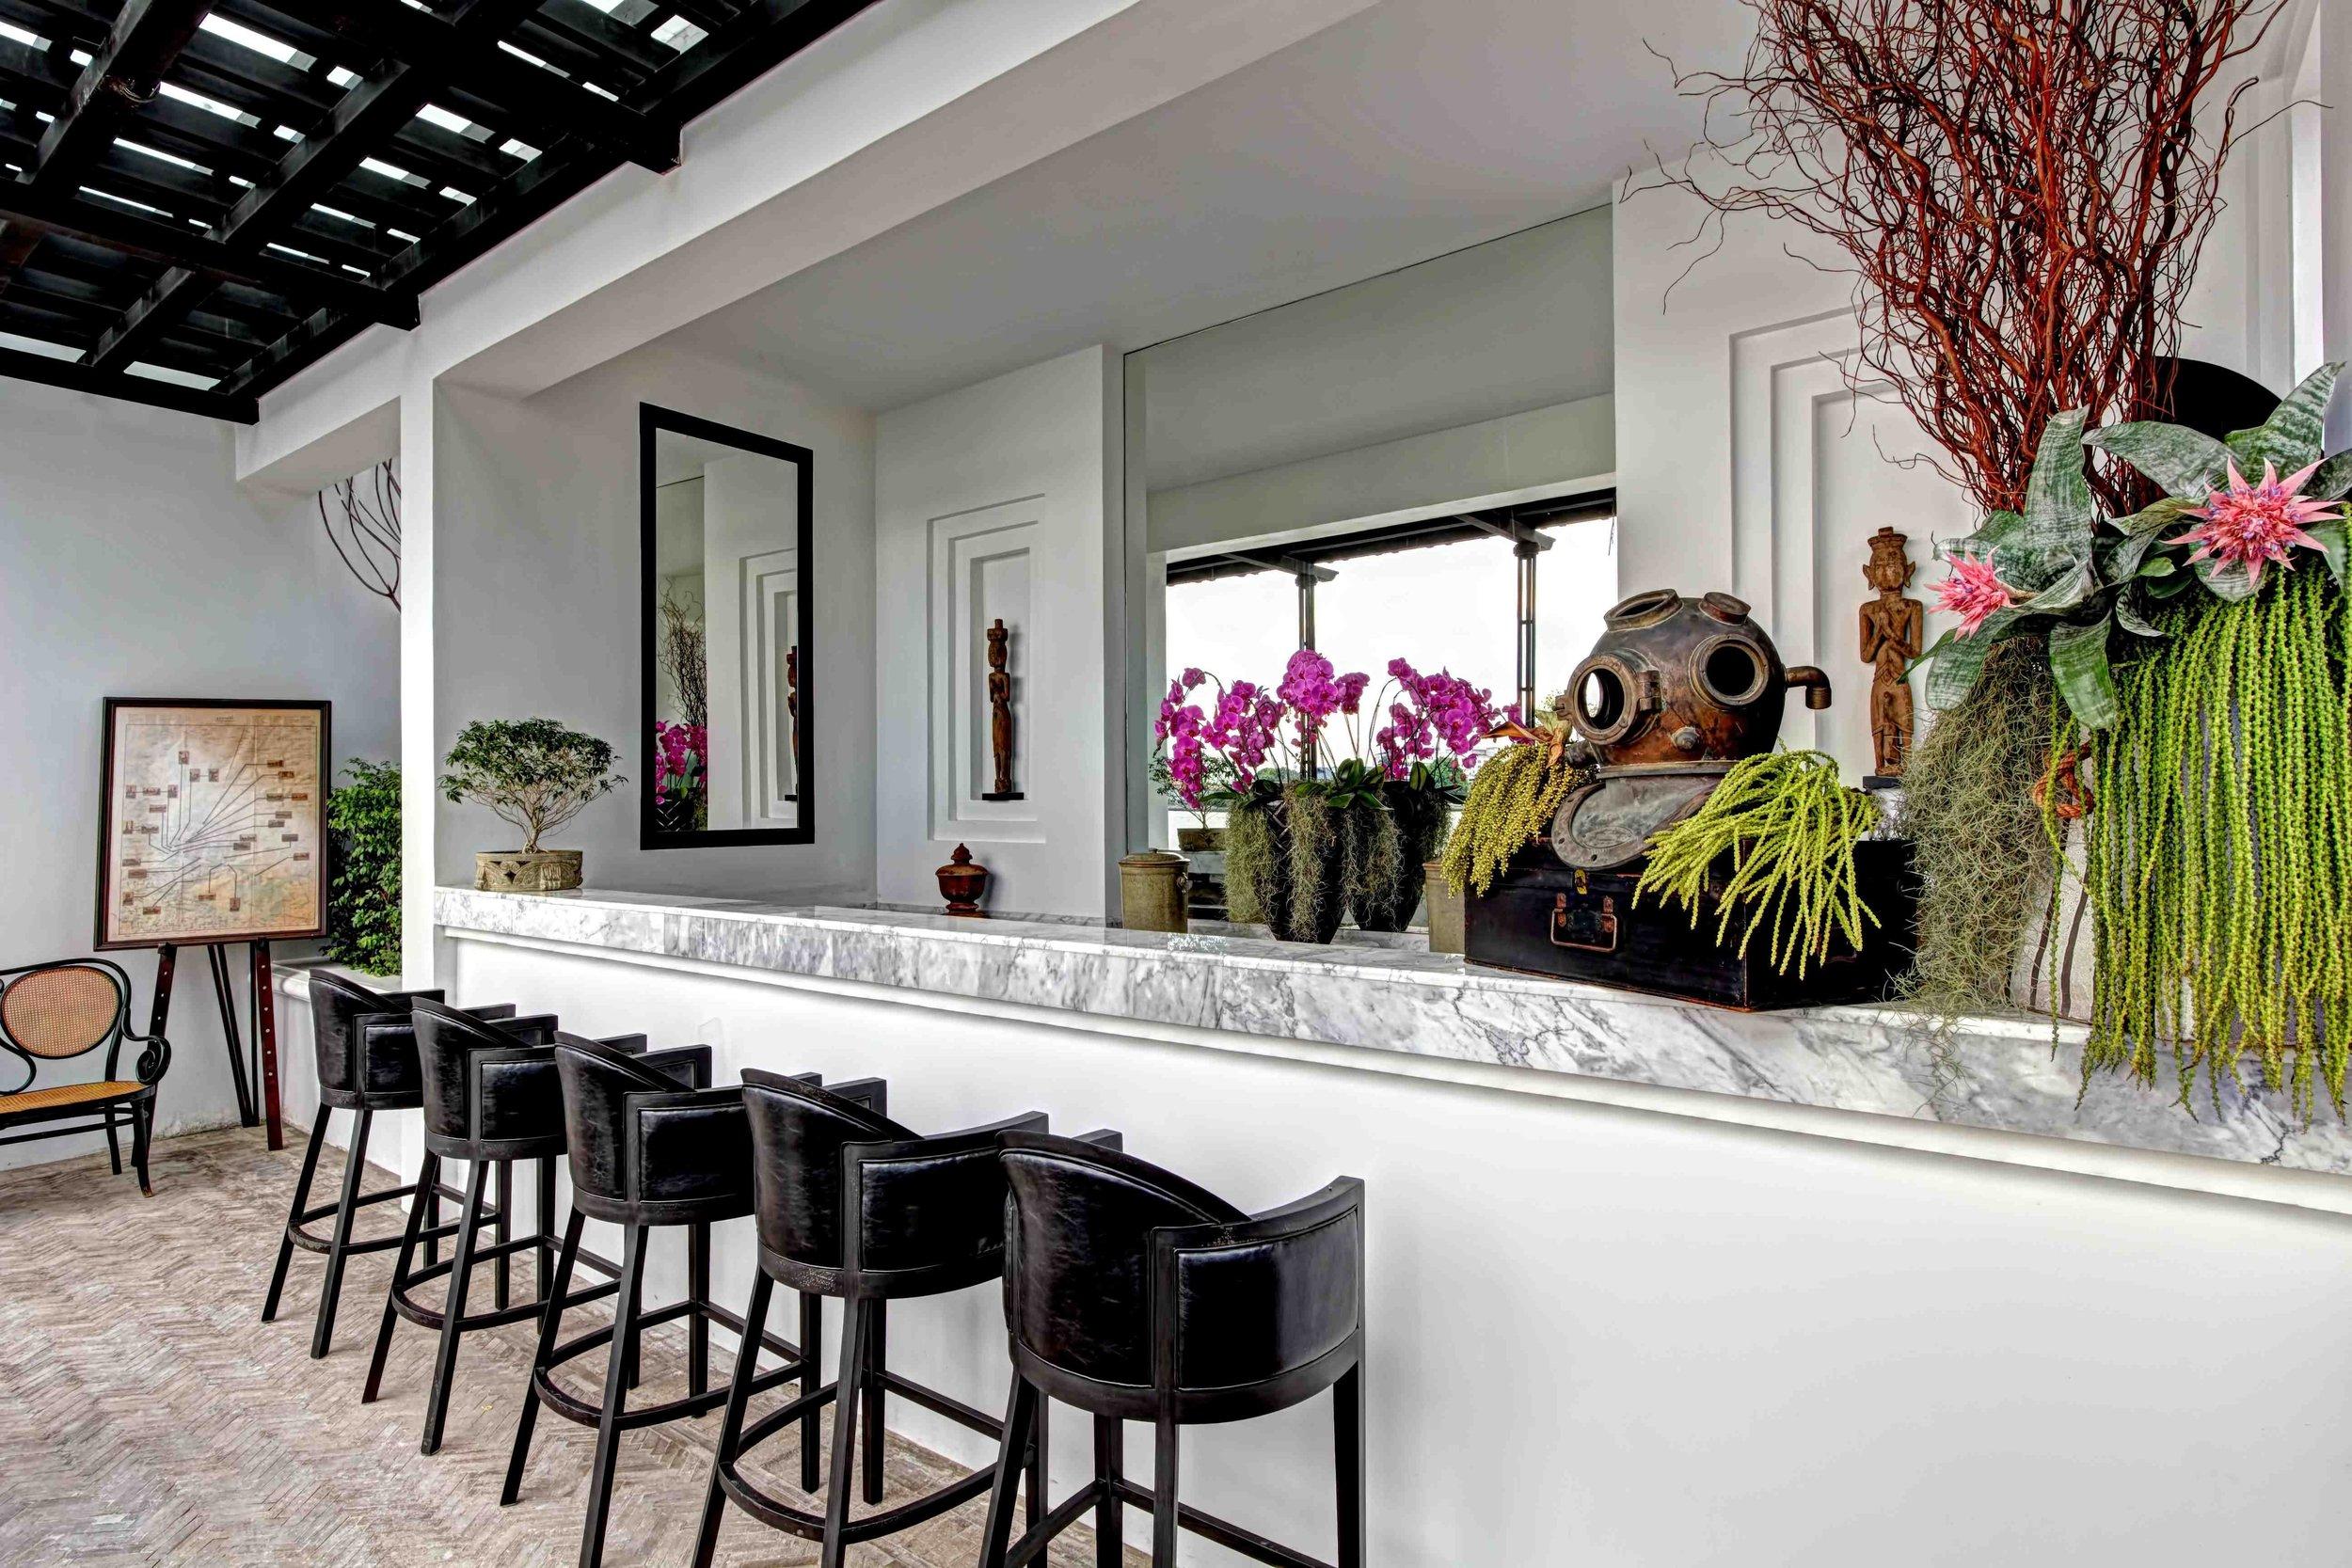 Bathers Bar - Photo Courtesy of The Siam Hotel